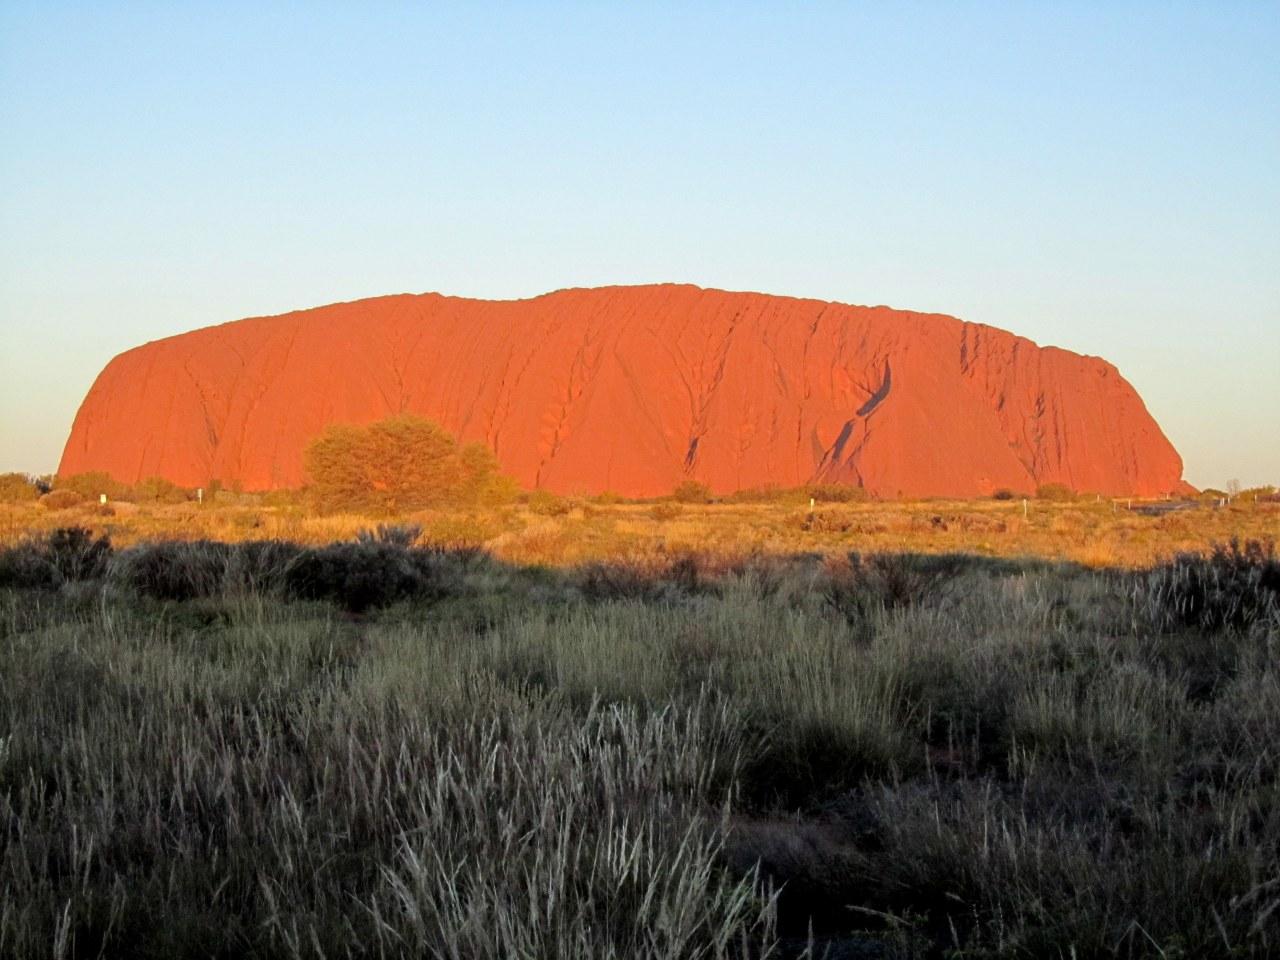 Shades of Uluru